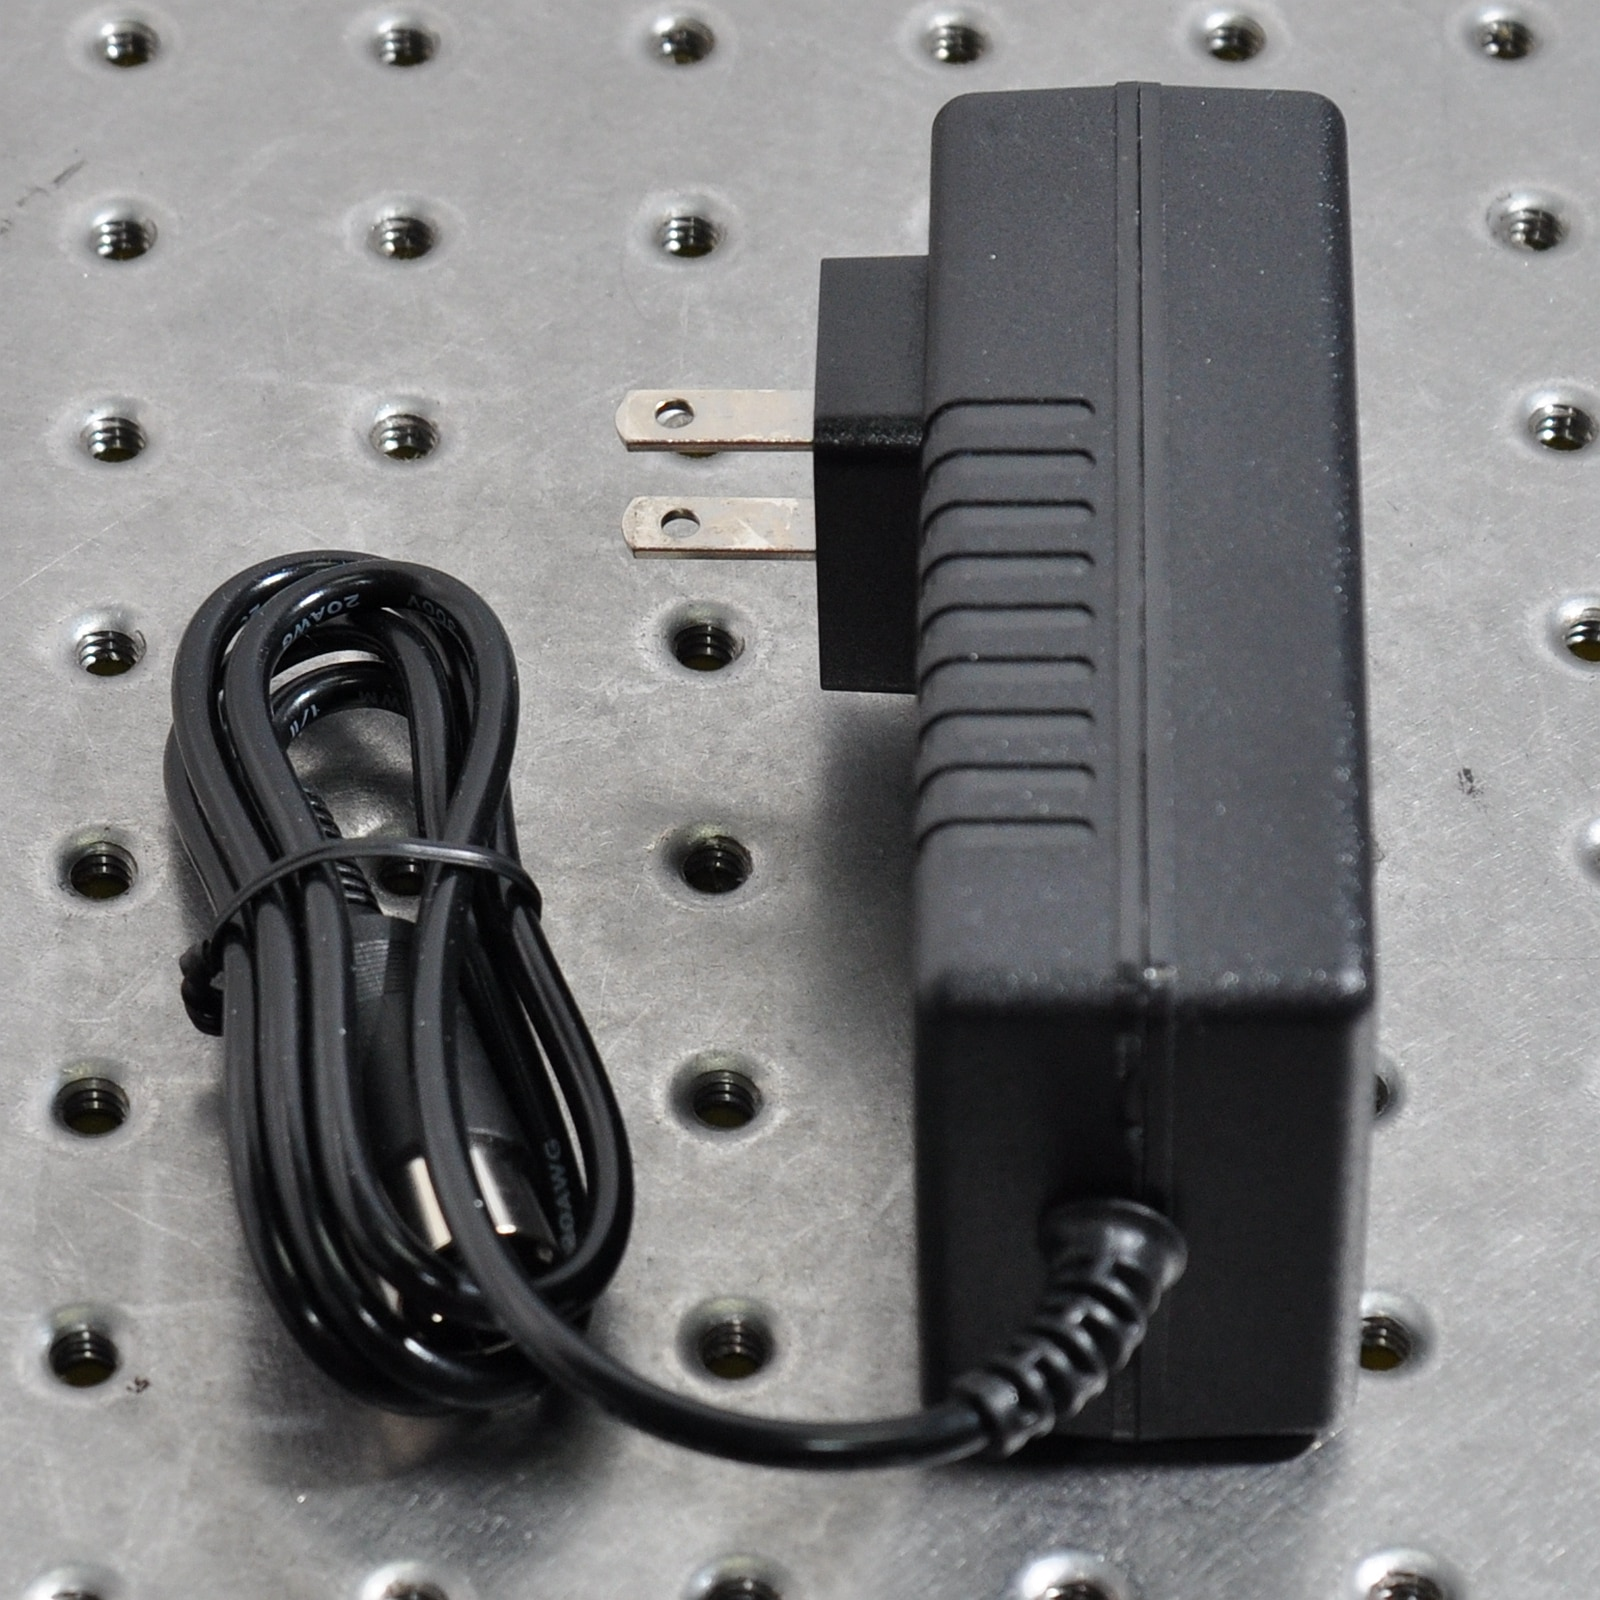 Panasonic UJ35 UV LED curing machine LED point light source machine with 2 4 irradiation heads ANUJ6017 enlarge